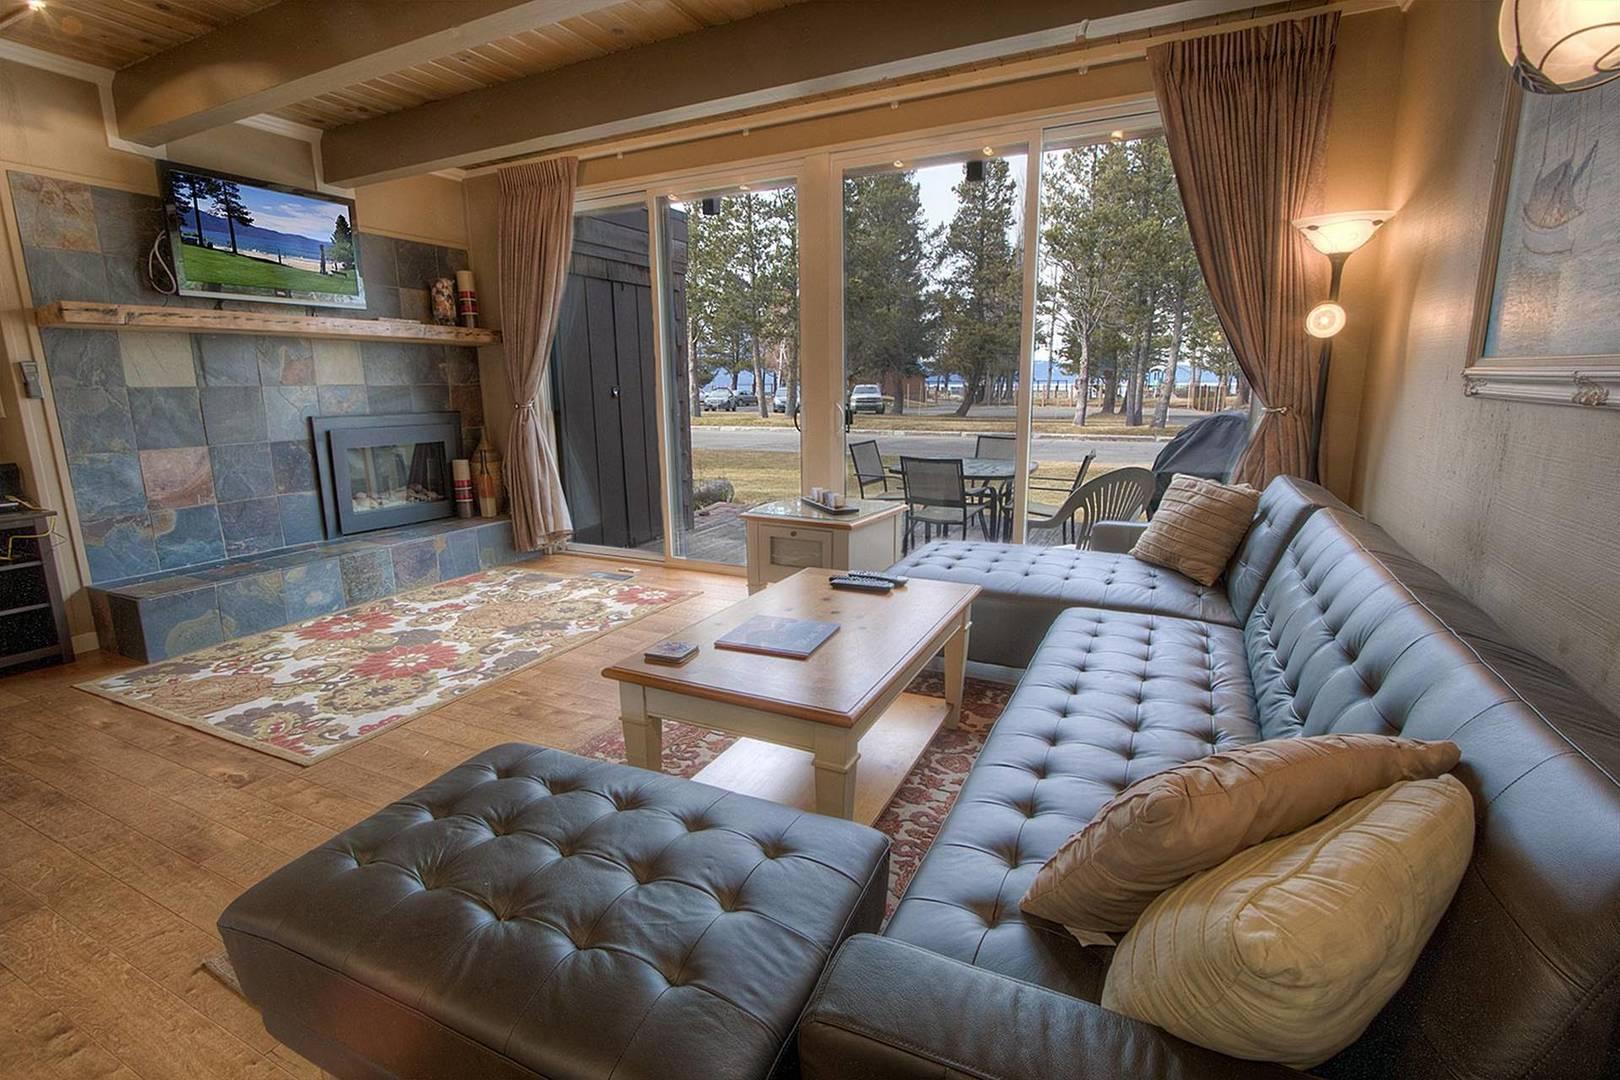 tkc0857 living room